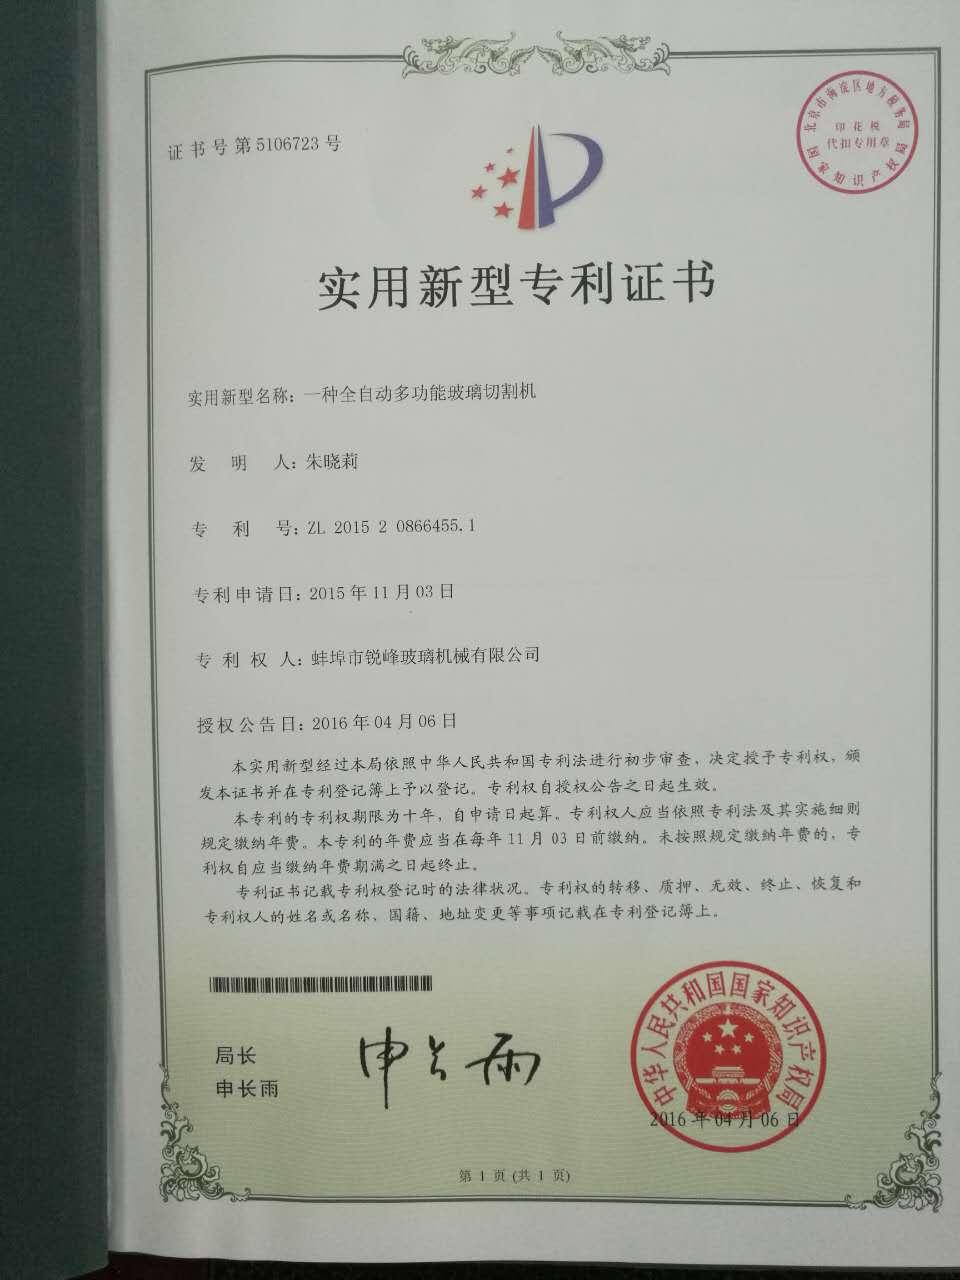 Patent NO.:ZL 2015 2 0866455.1